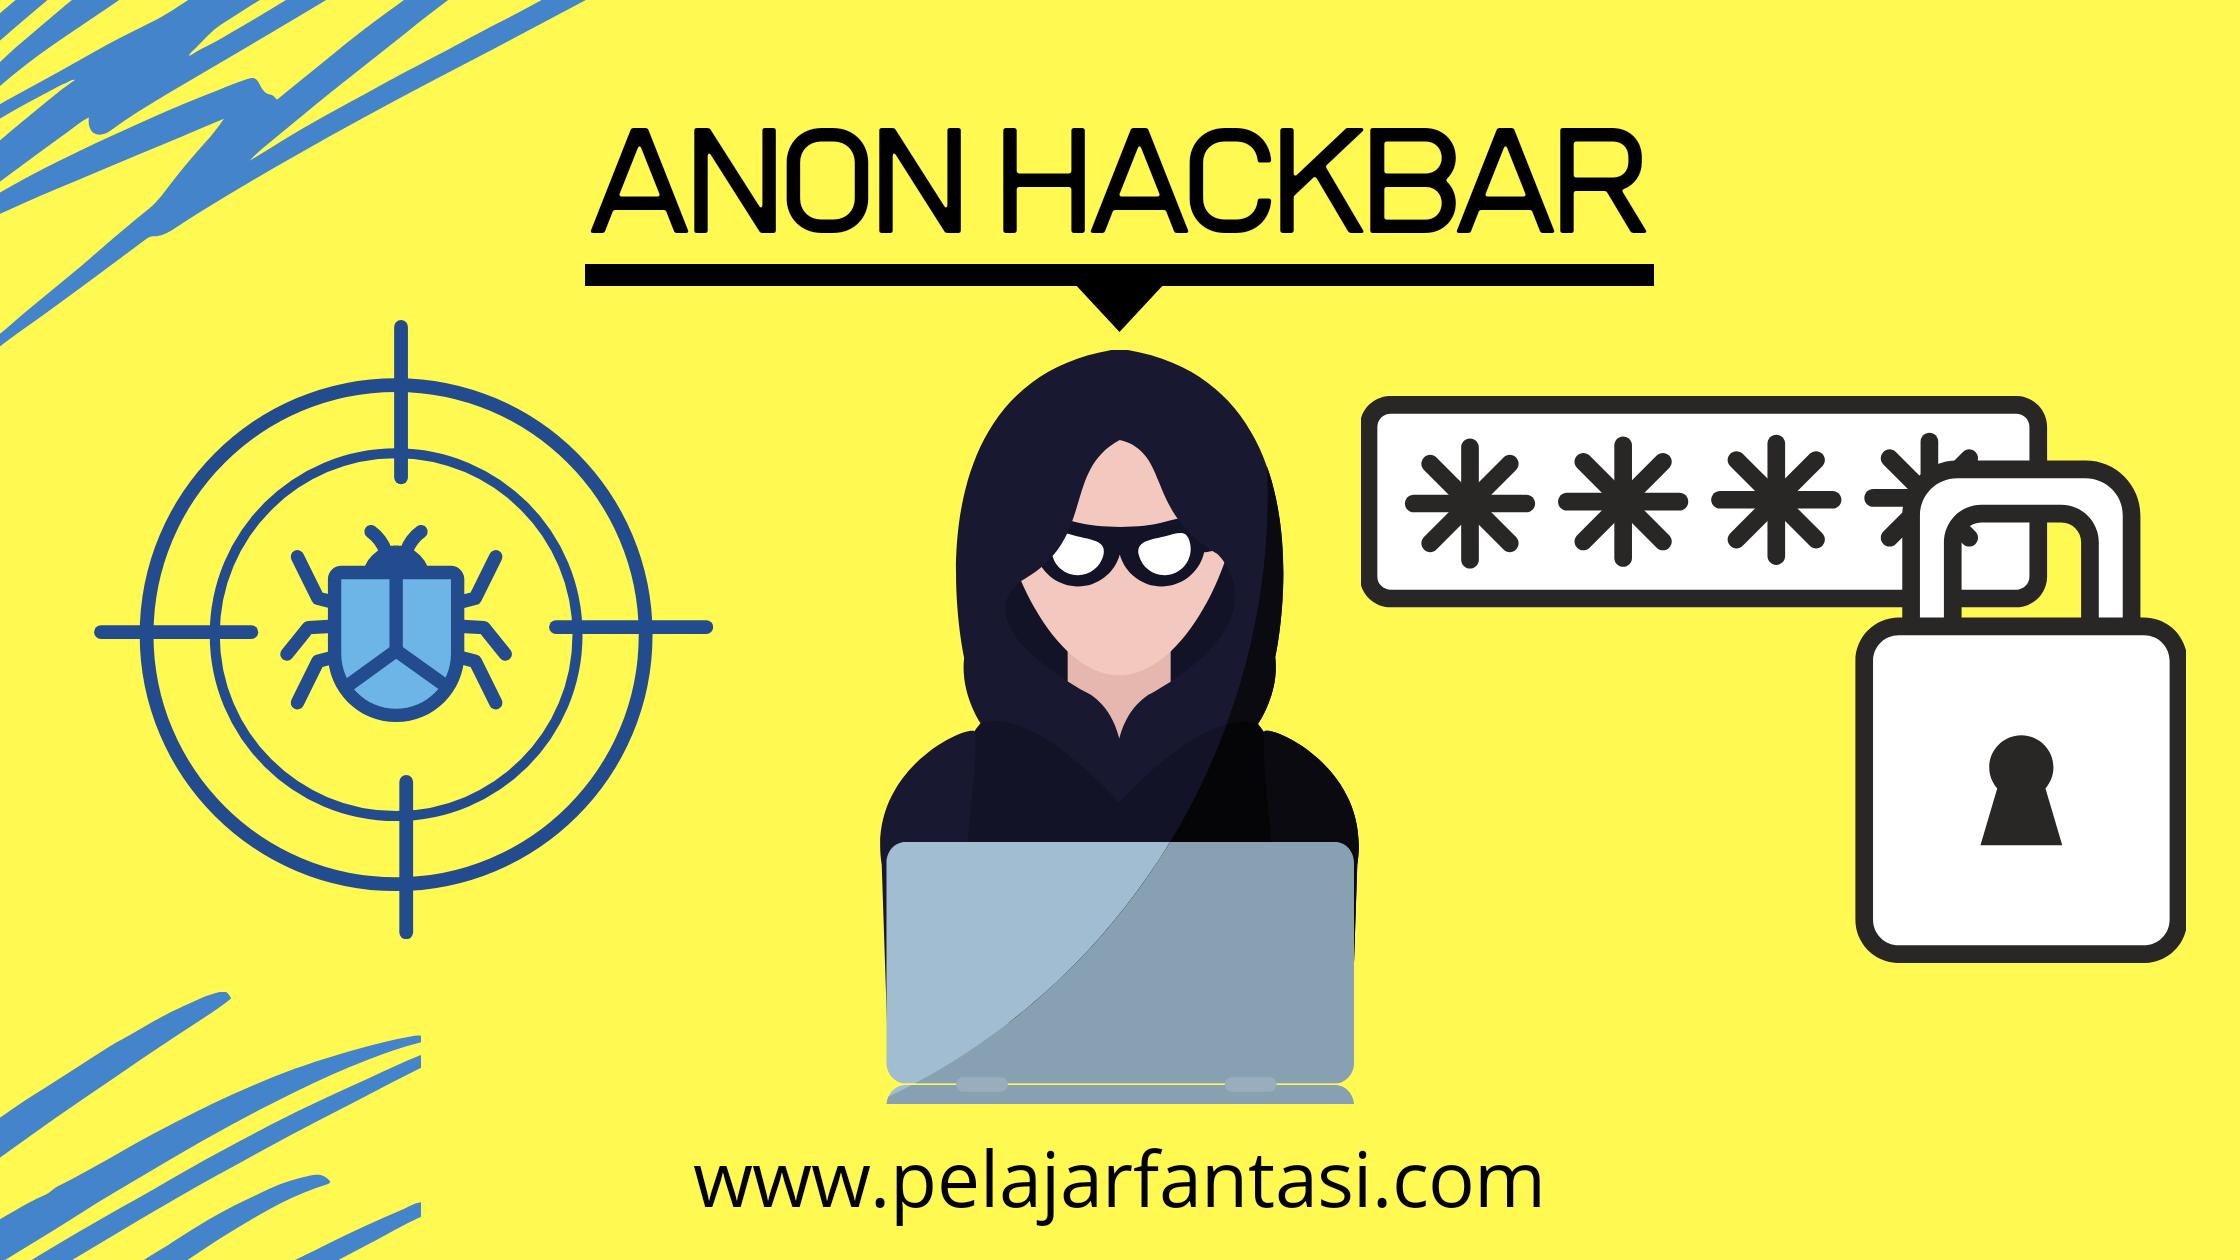 Download Apk Anon Hackbar Terbaru V1.5 2021